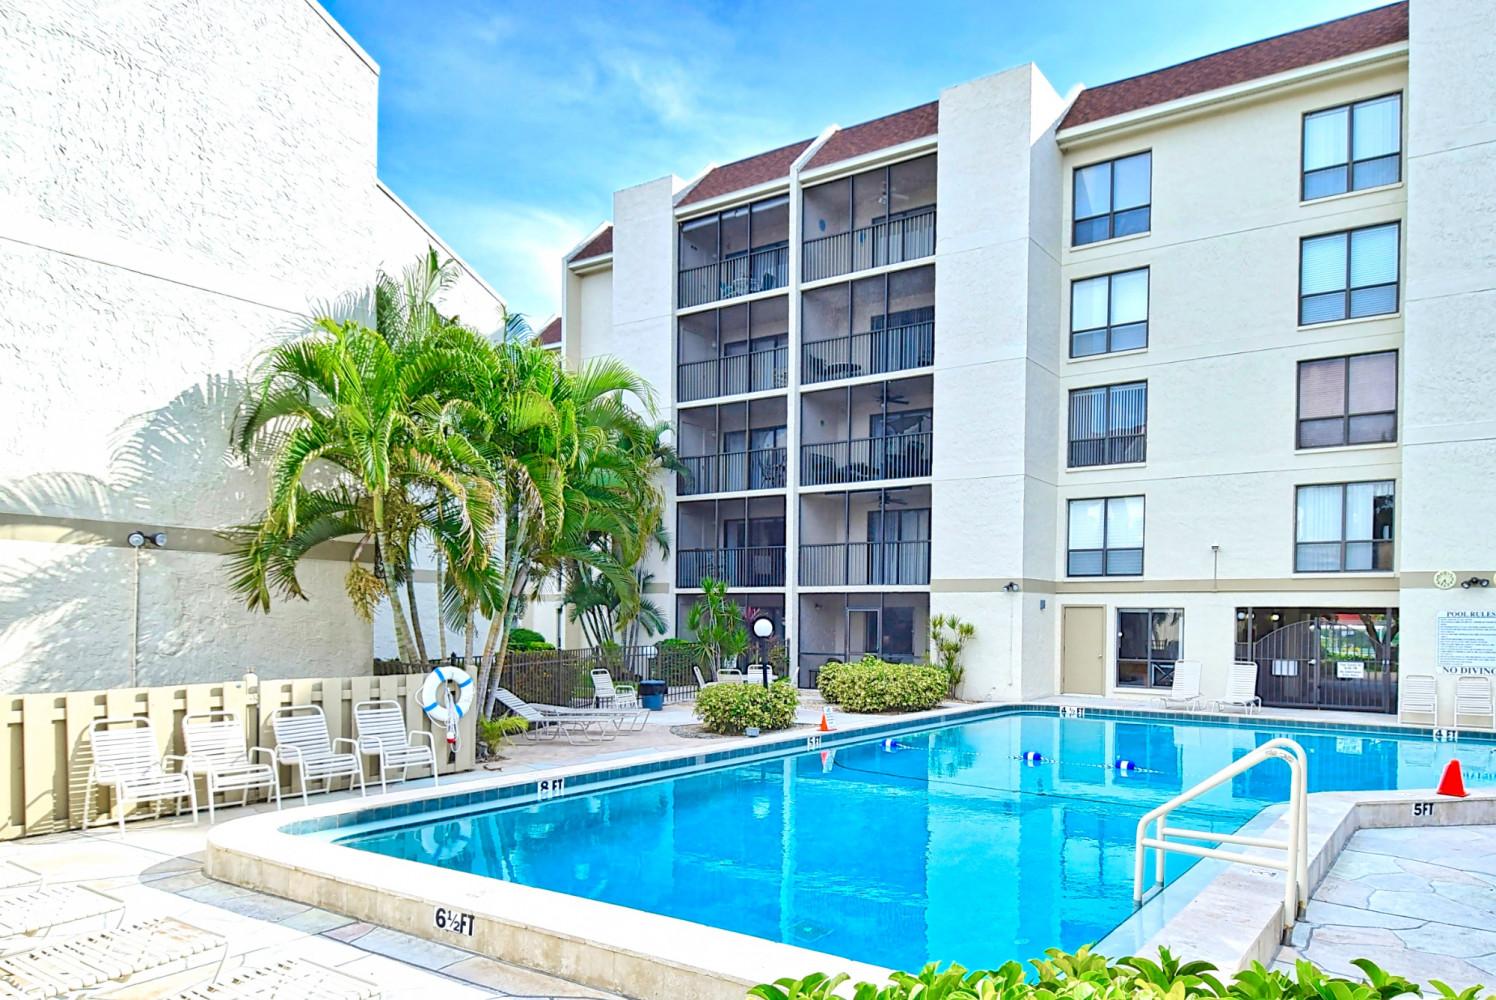 E33 - Siesta Key Vacation Rentals